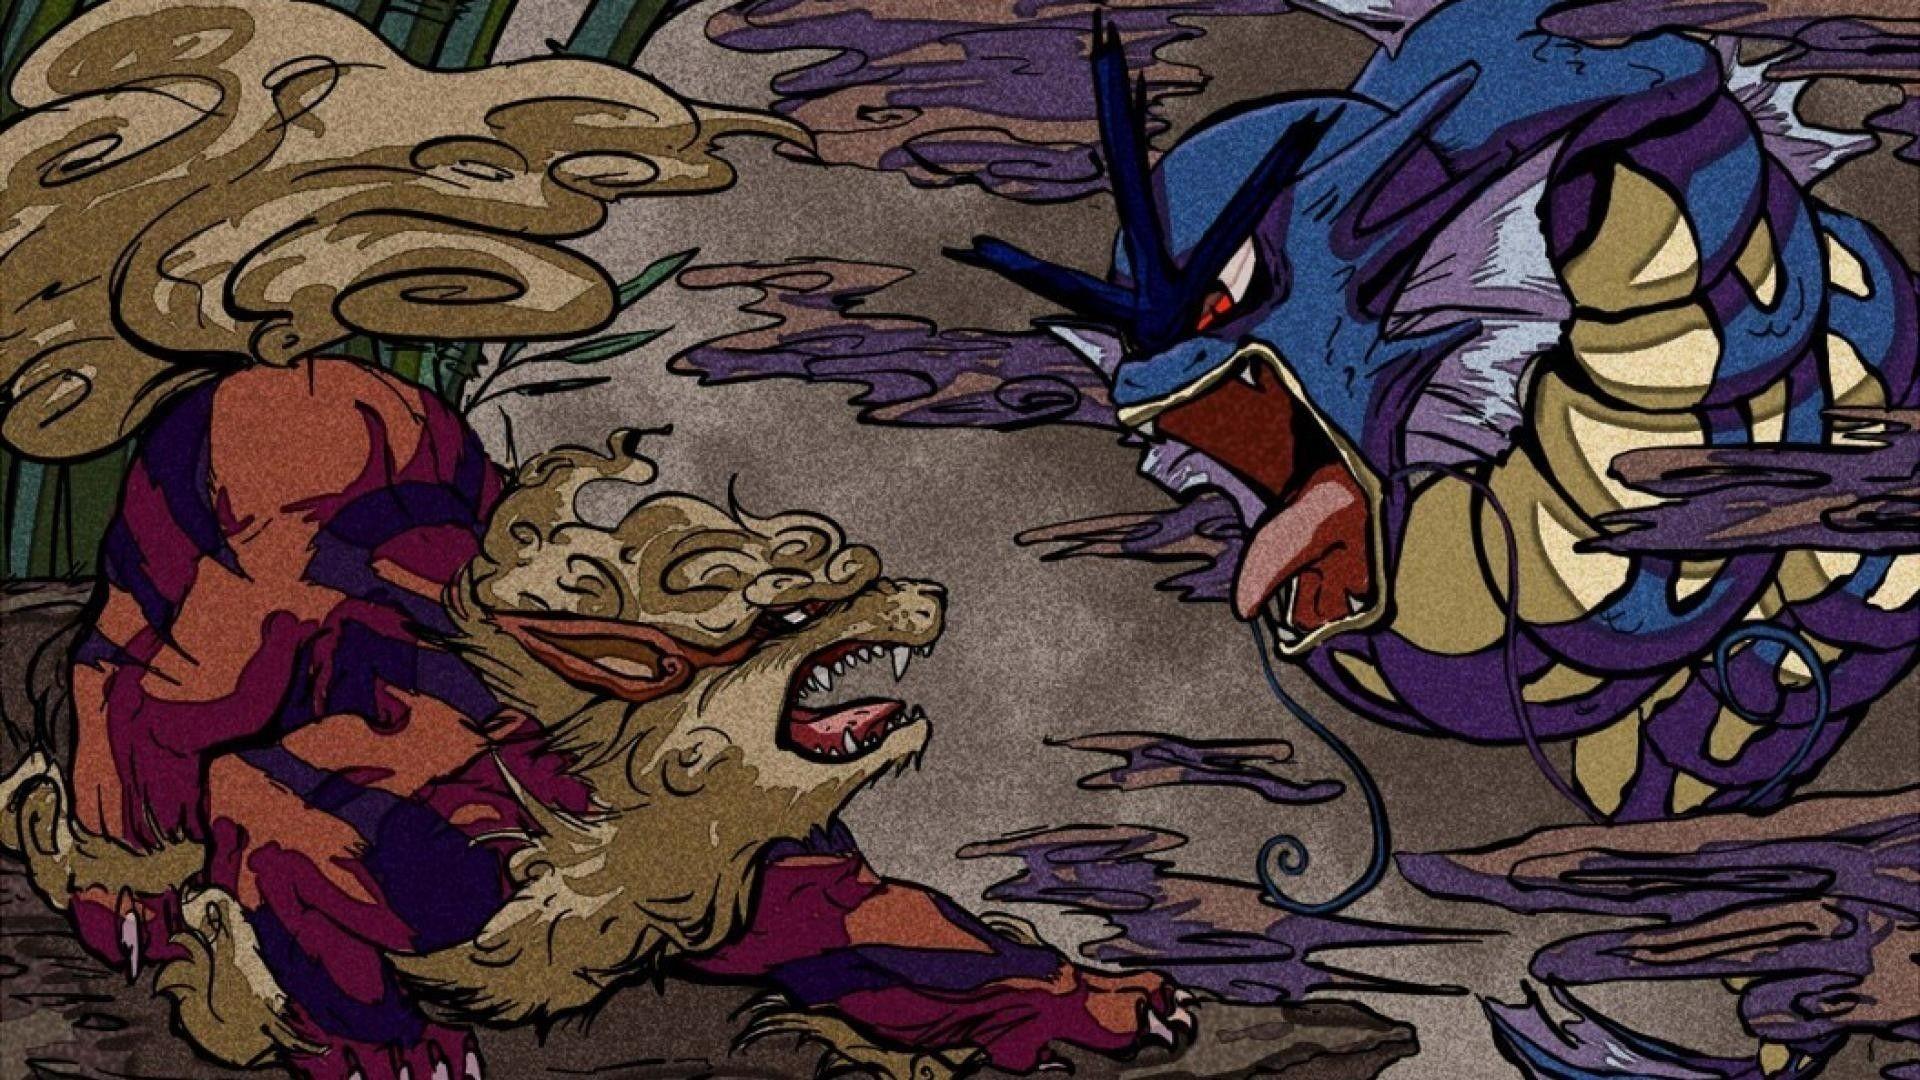 Res: 1920x1080,  Arcanine VS Gyarados Japanese Art Wallpaper Wallpaper